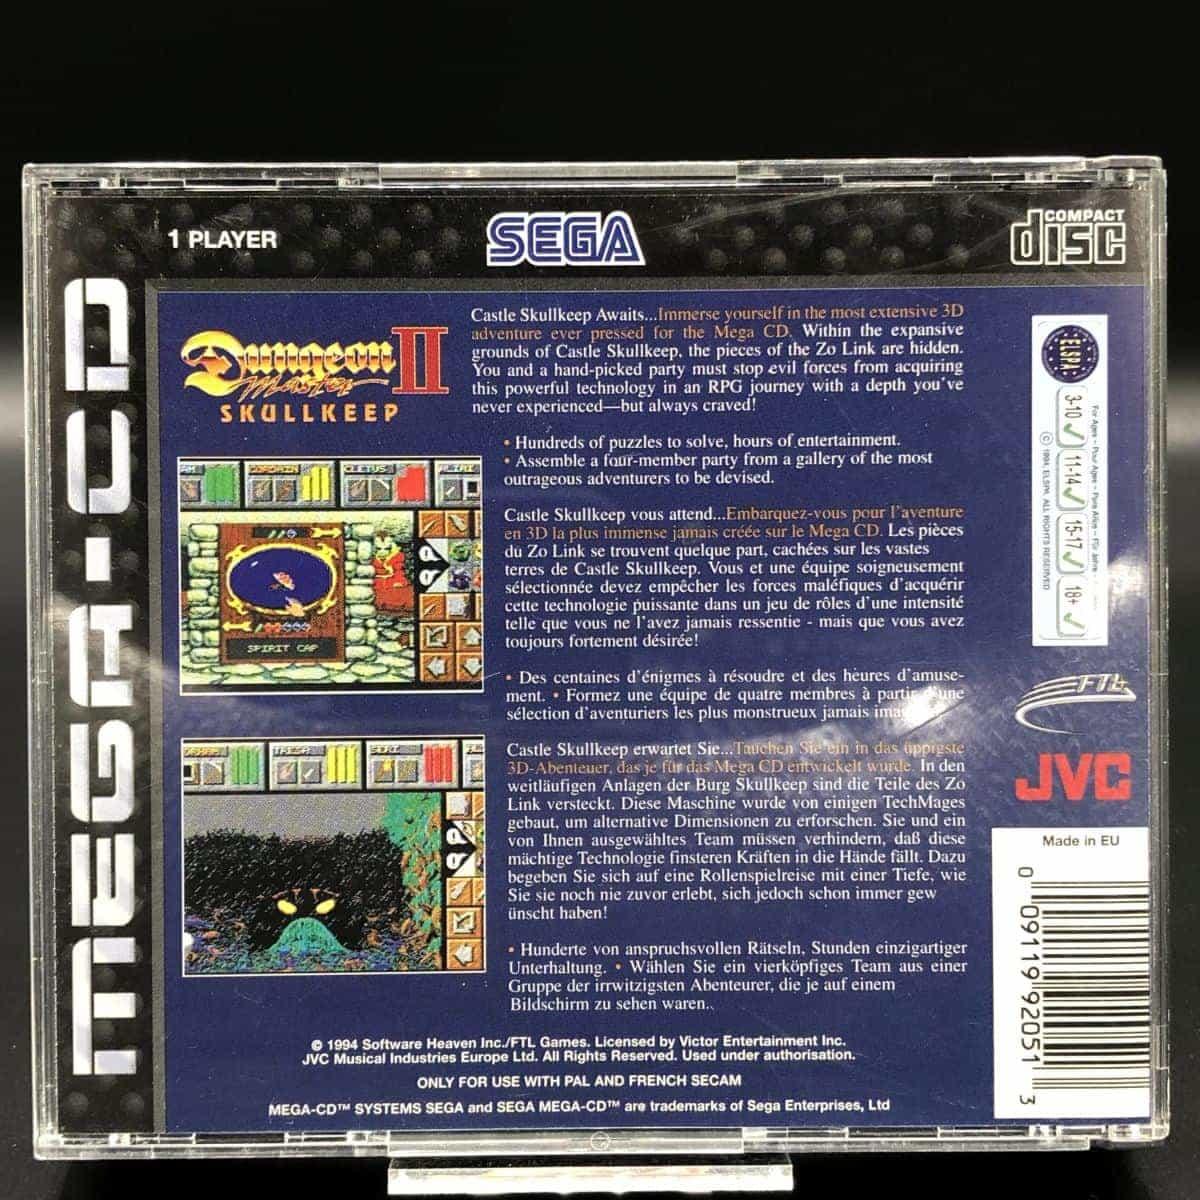 Dungeon Master II: The Legend of Skullkeep (Komplett) (Sehr gut) Sega Mega CD